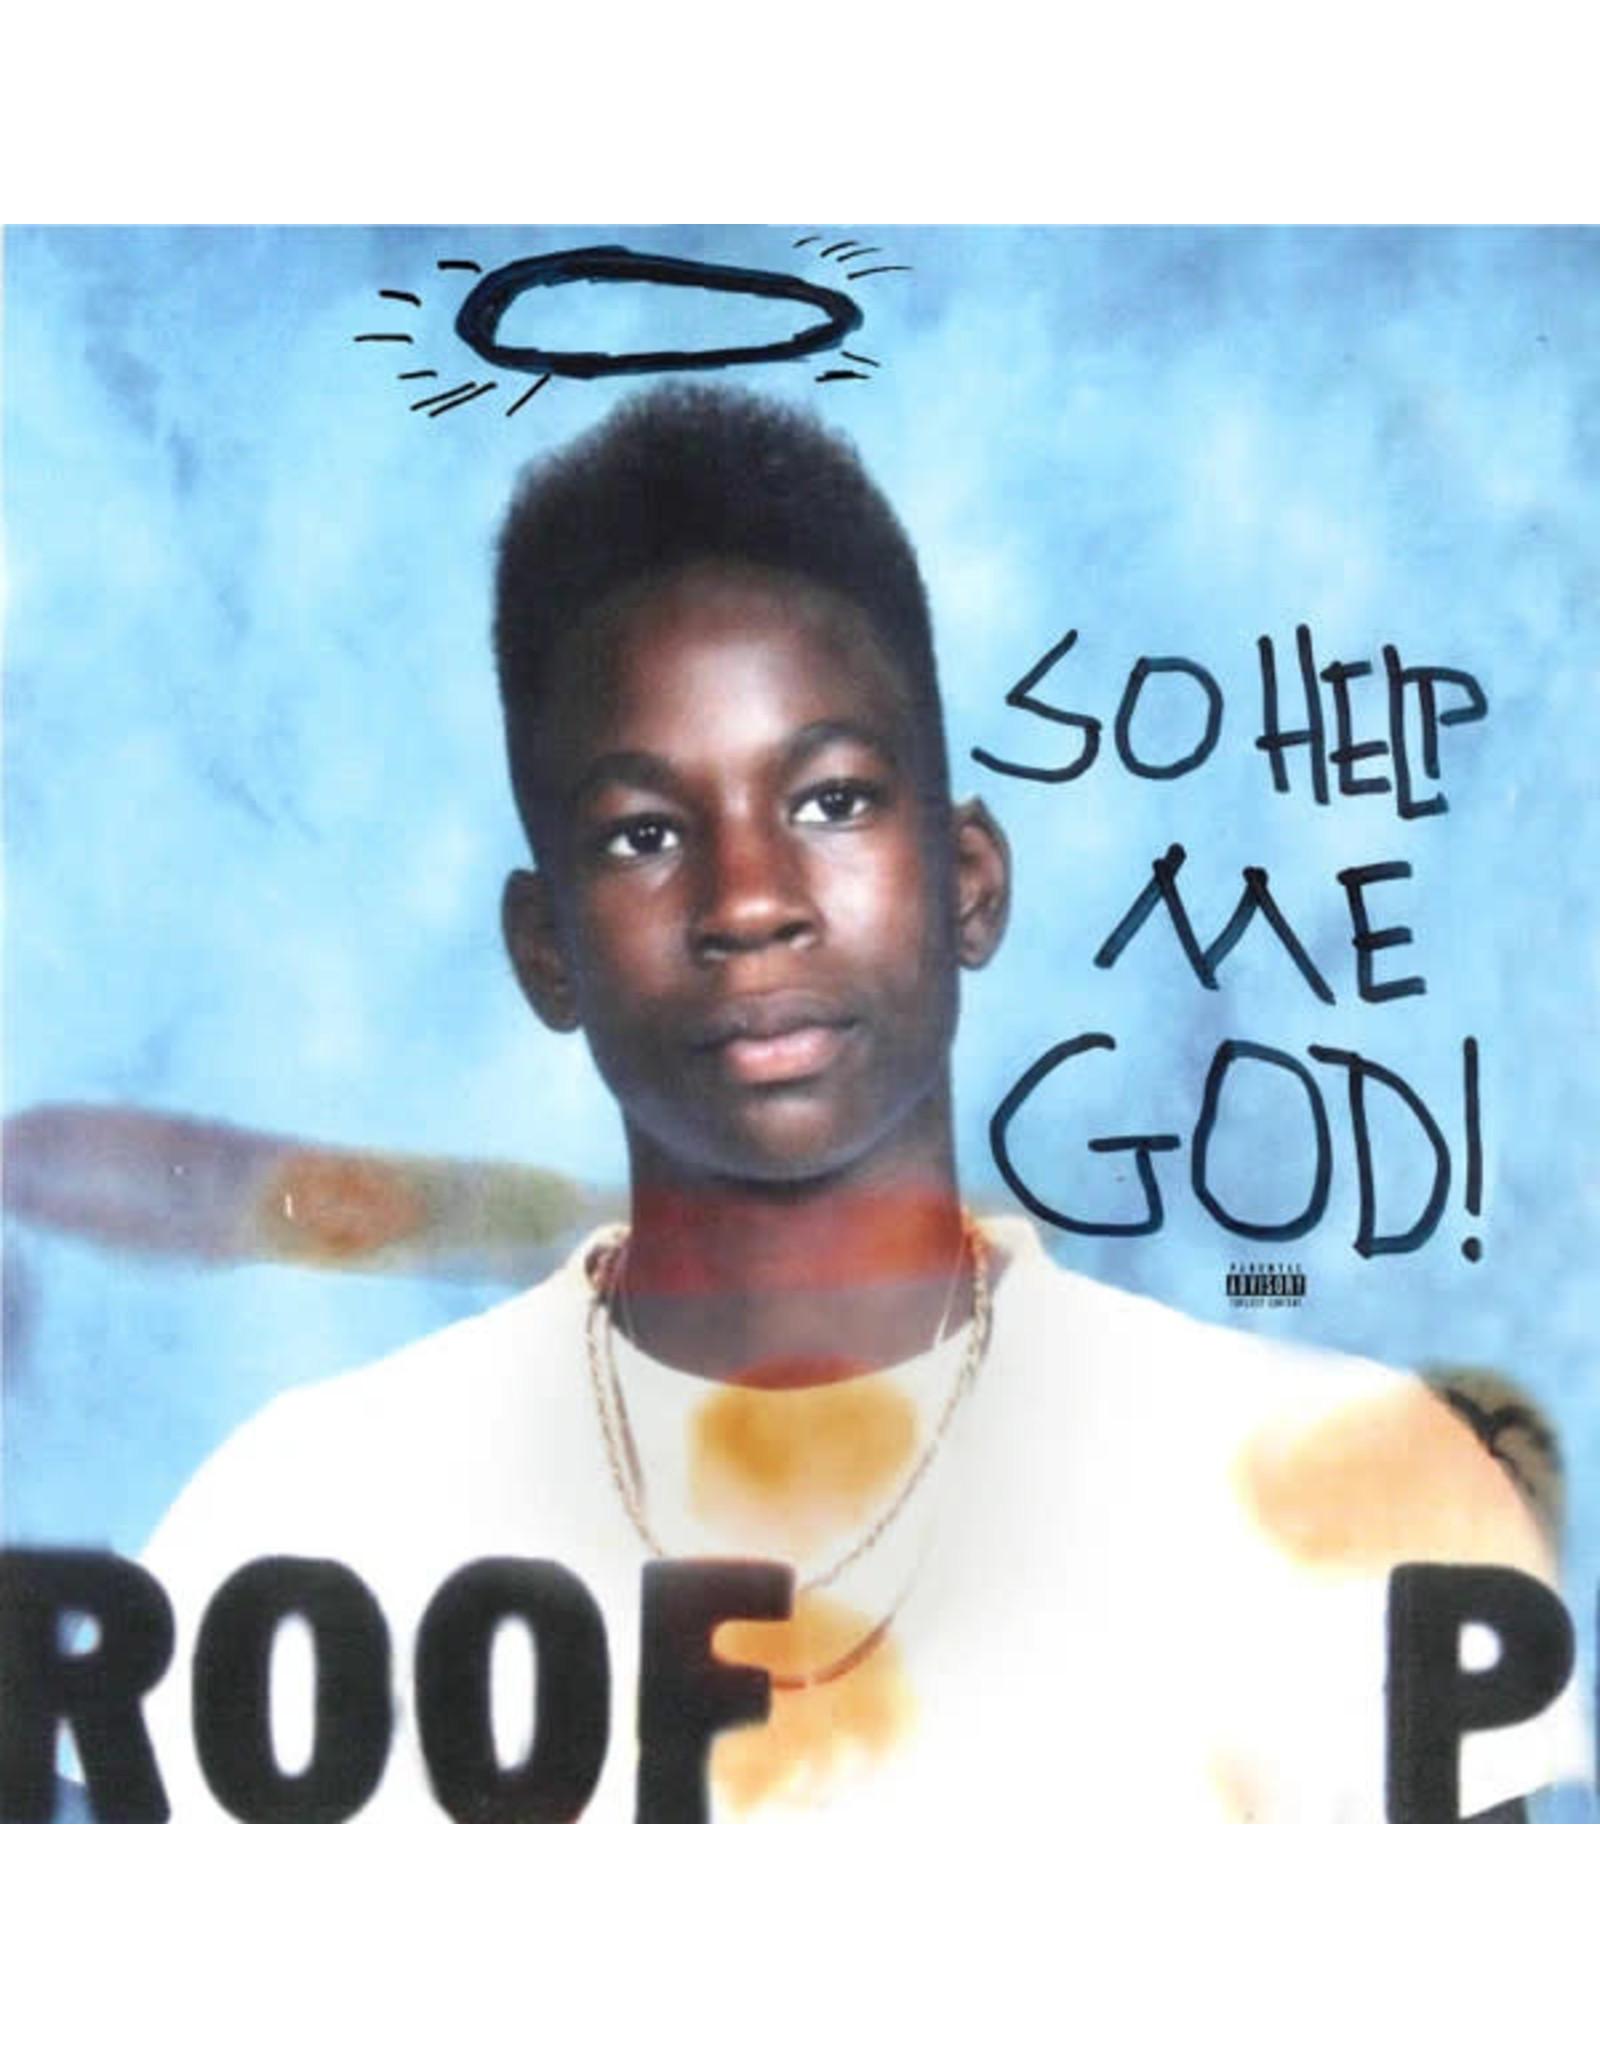 2 Chainz - So Help Me God LP